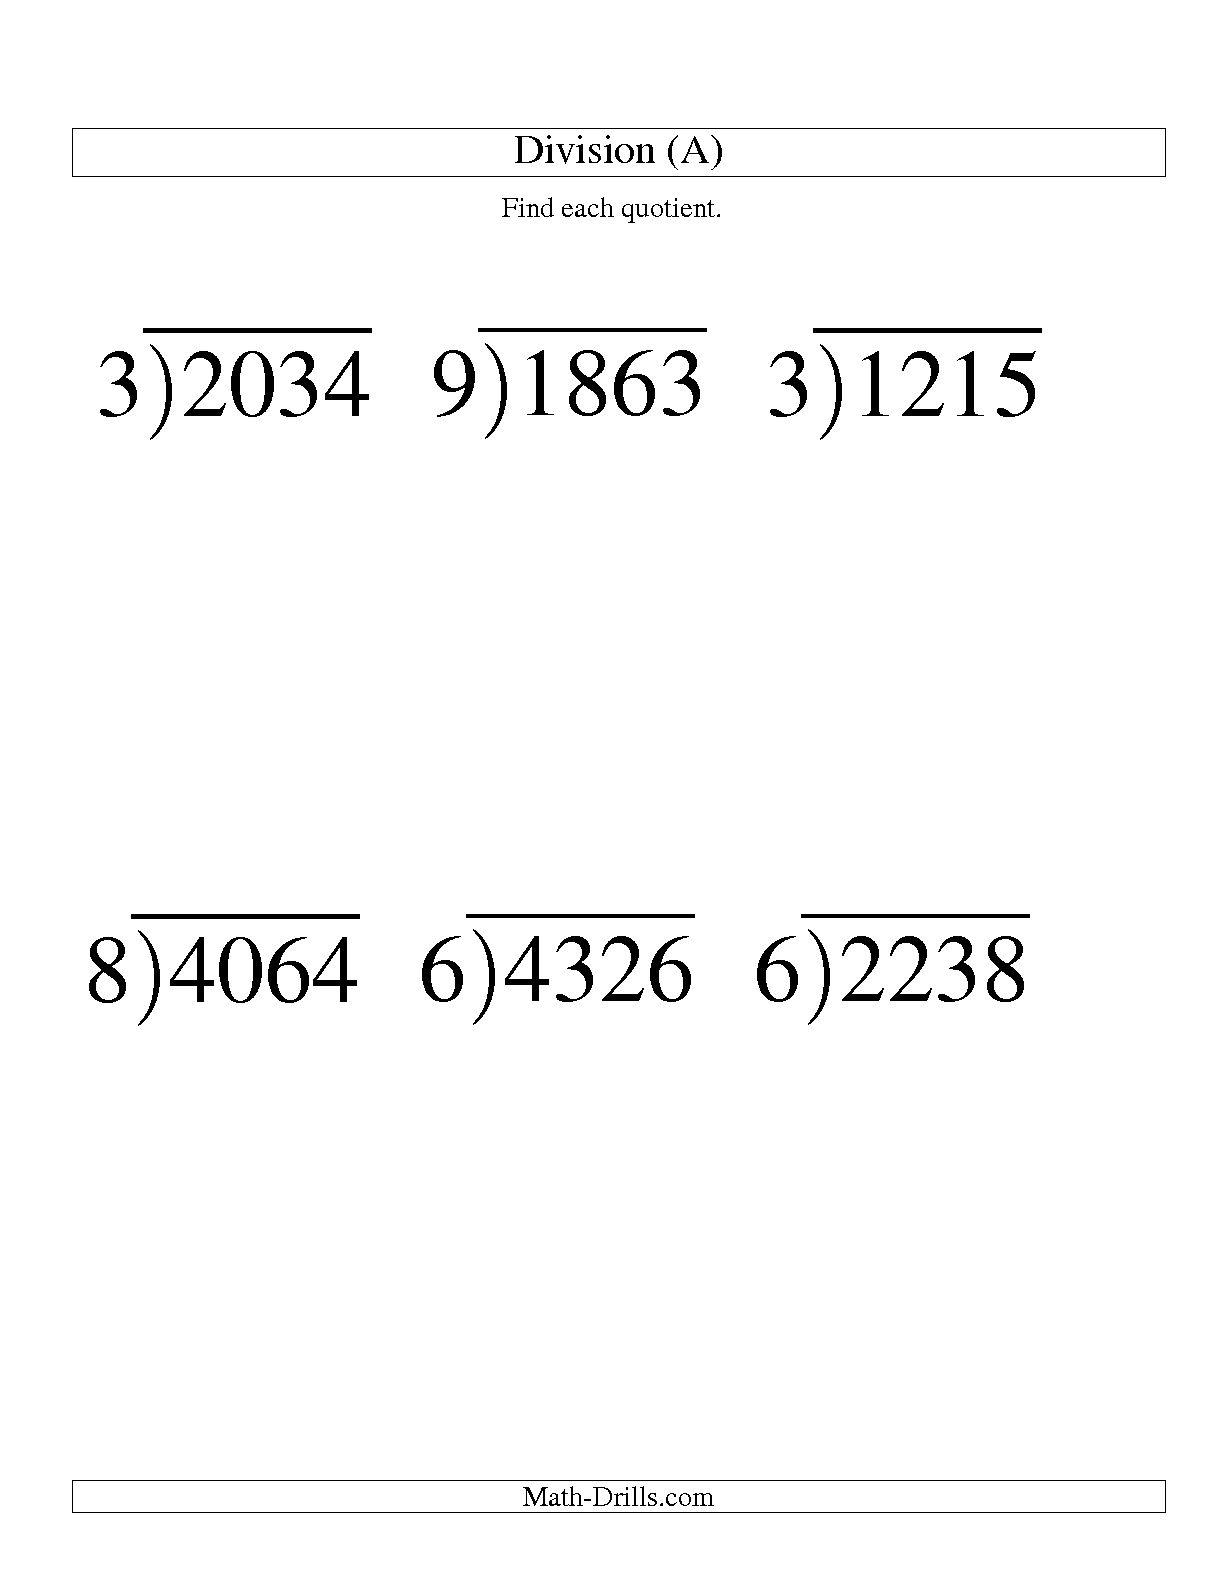 9 Best Images of Long Division Worksheets Printable - Printable ...Long Division with Remainders Worksheets